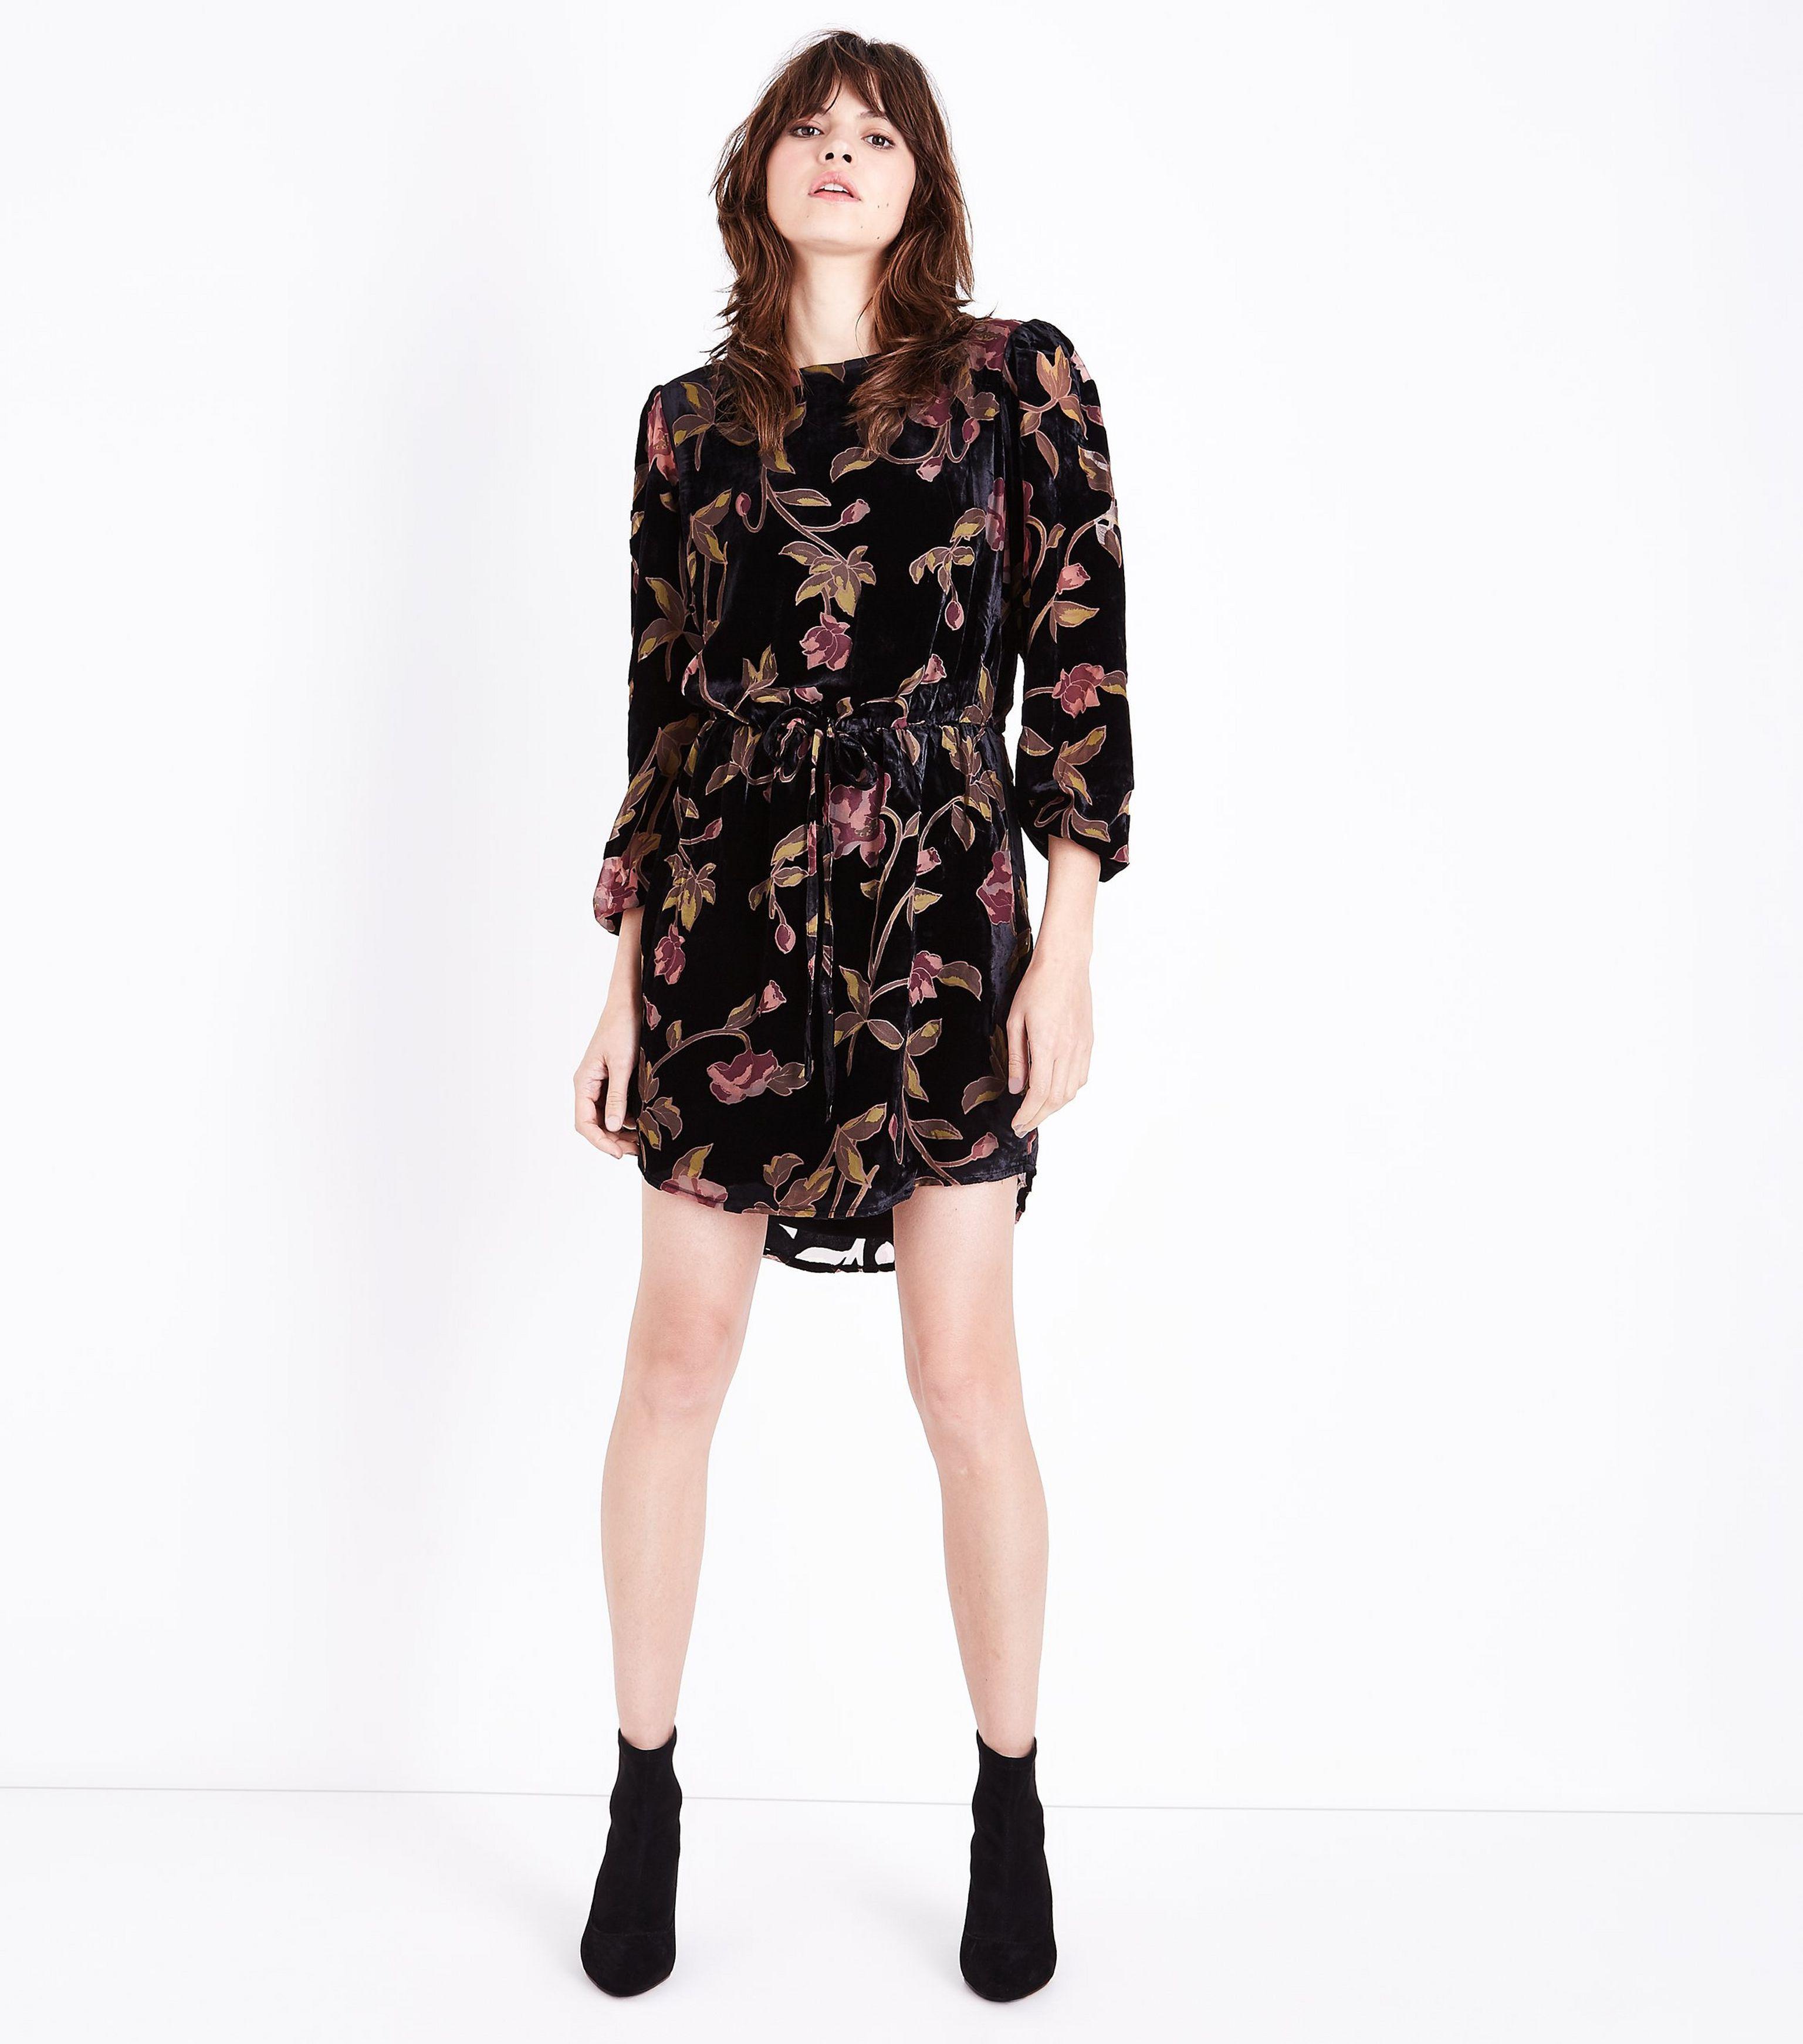 776f5498ec8 New Look Black Floral Velvet Burnout Tunic Dress in Black - Lyst